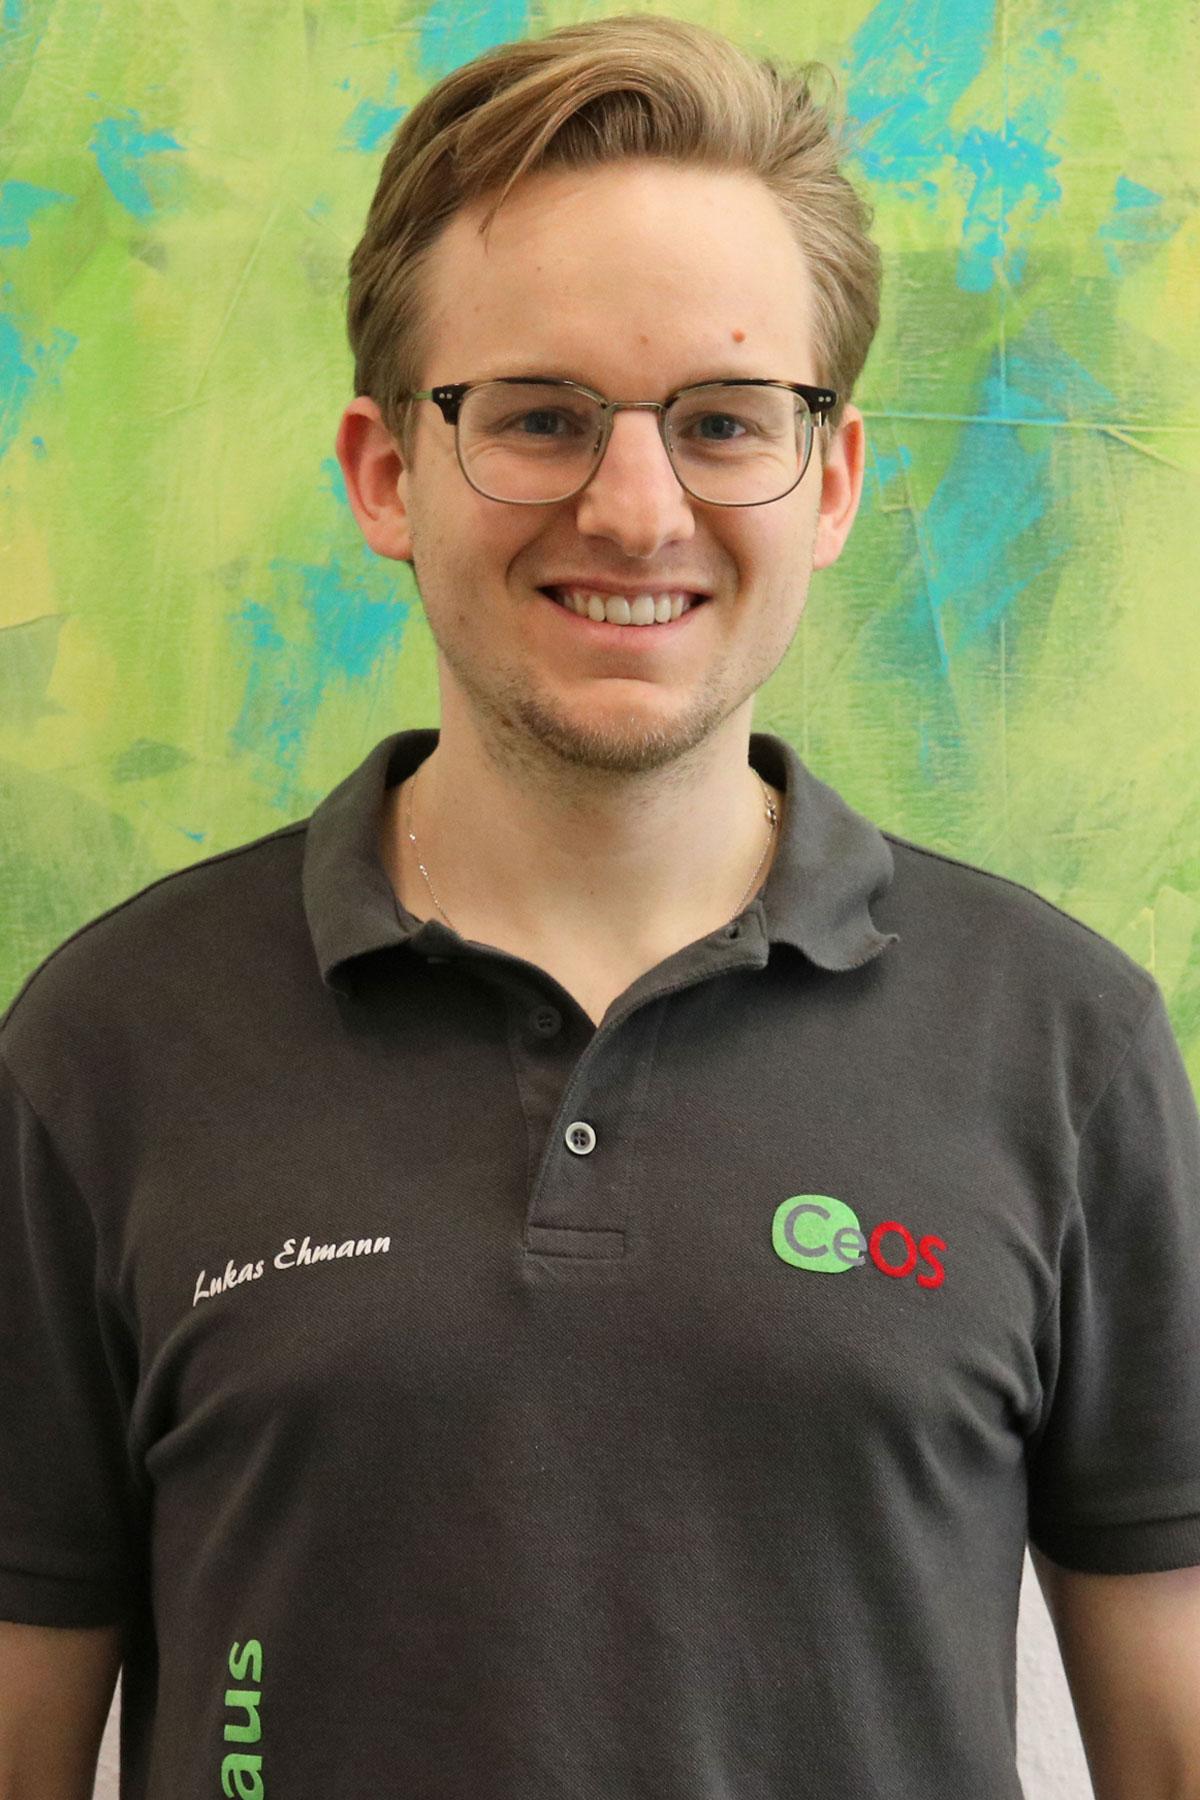 Lukas Ehmann